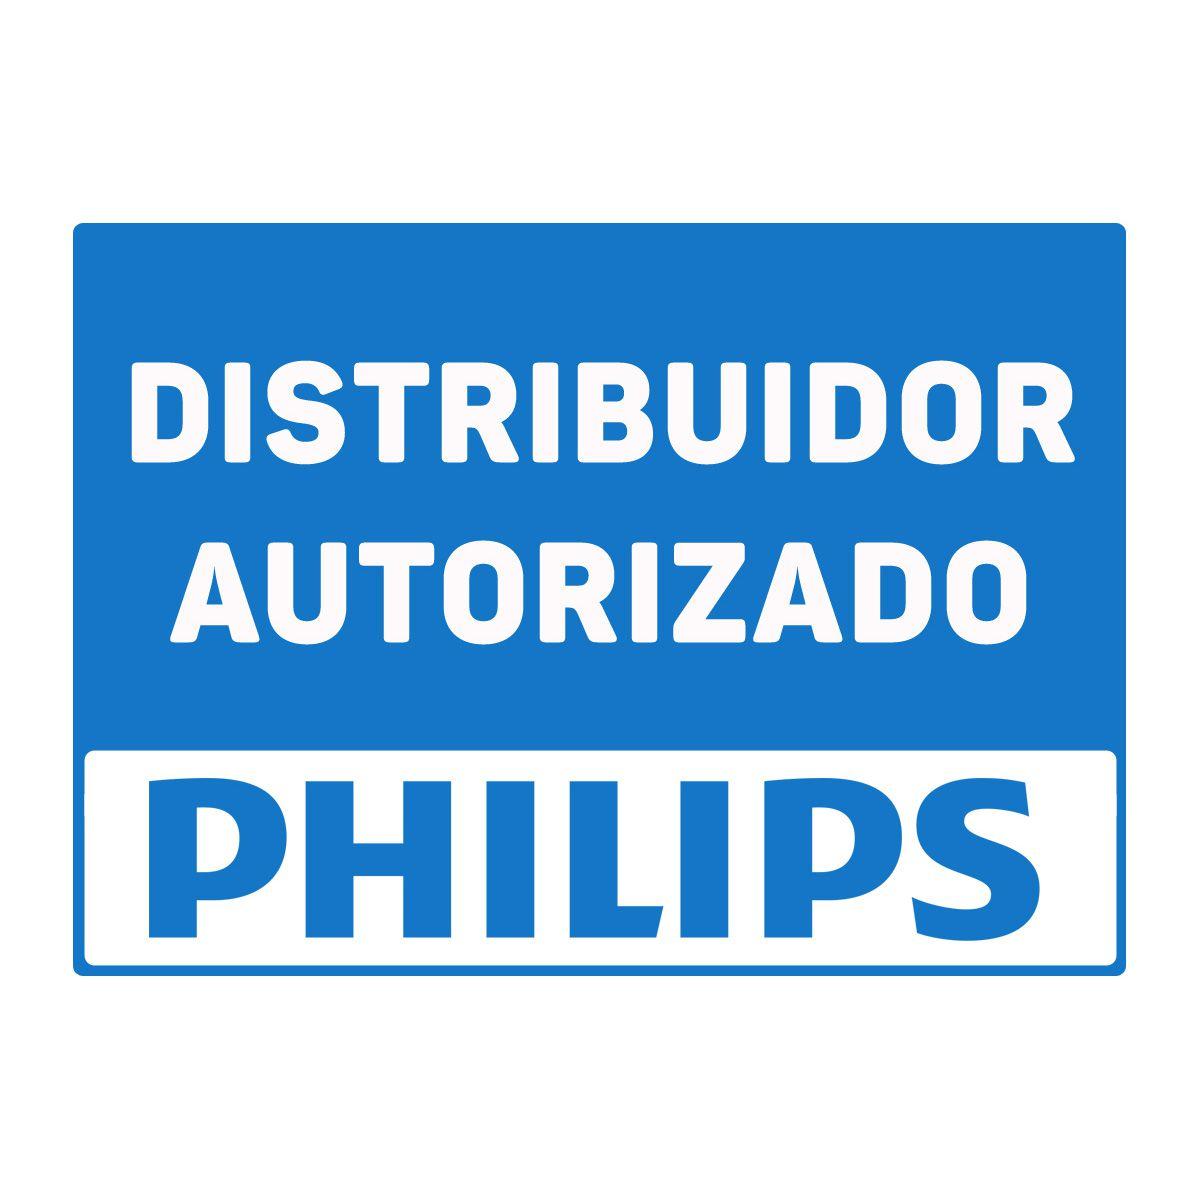 Lâmpada LedSpot 4,5W GU10 2700K 220V Philips